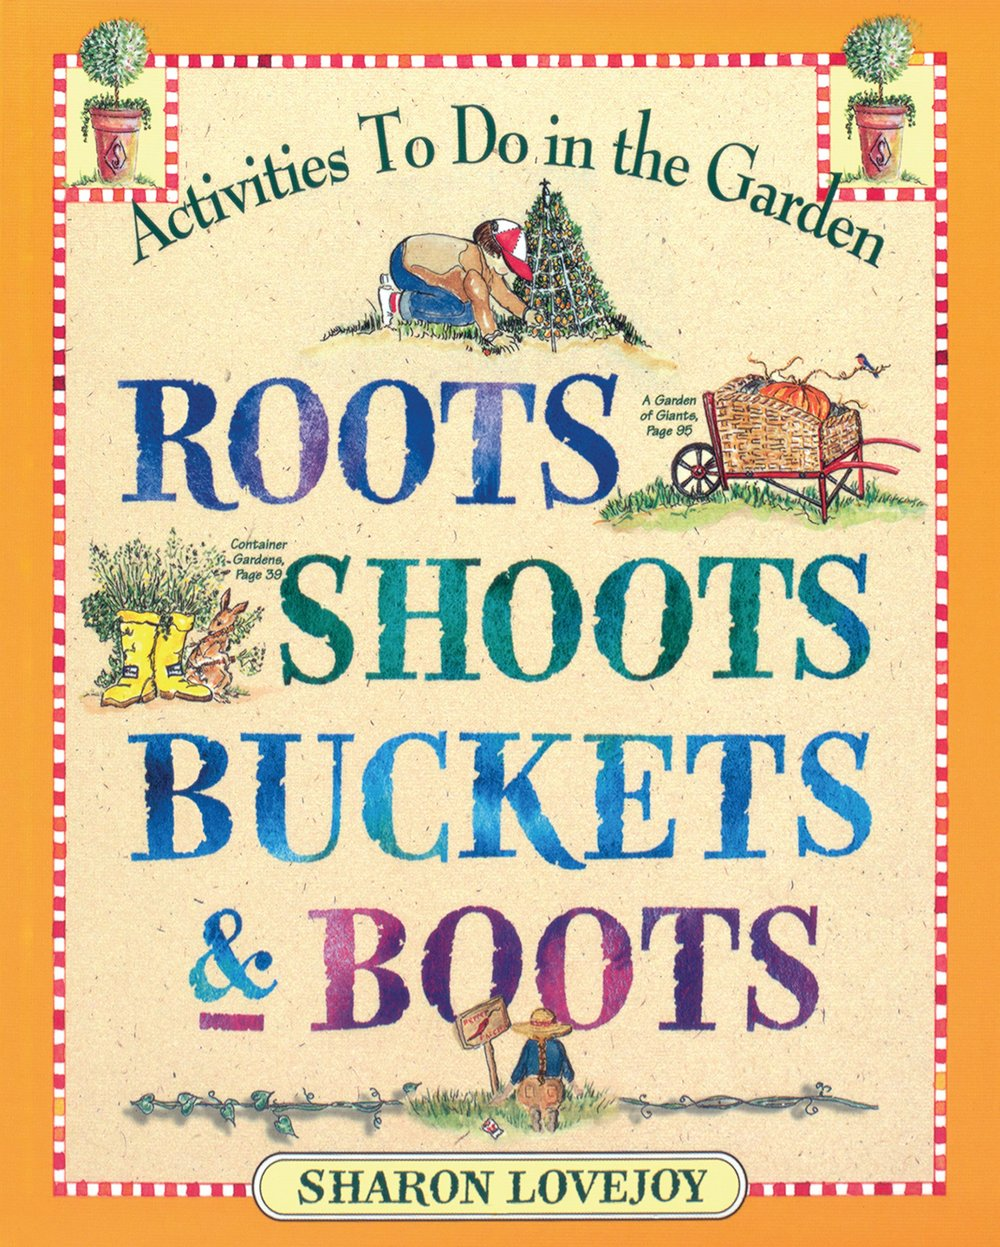 Roots Shoots Buckets & Boots.jpg